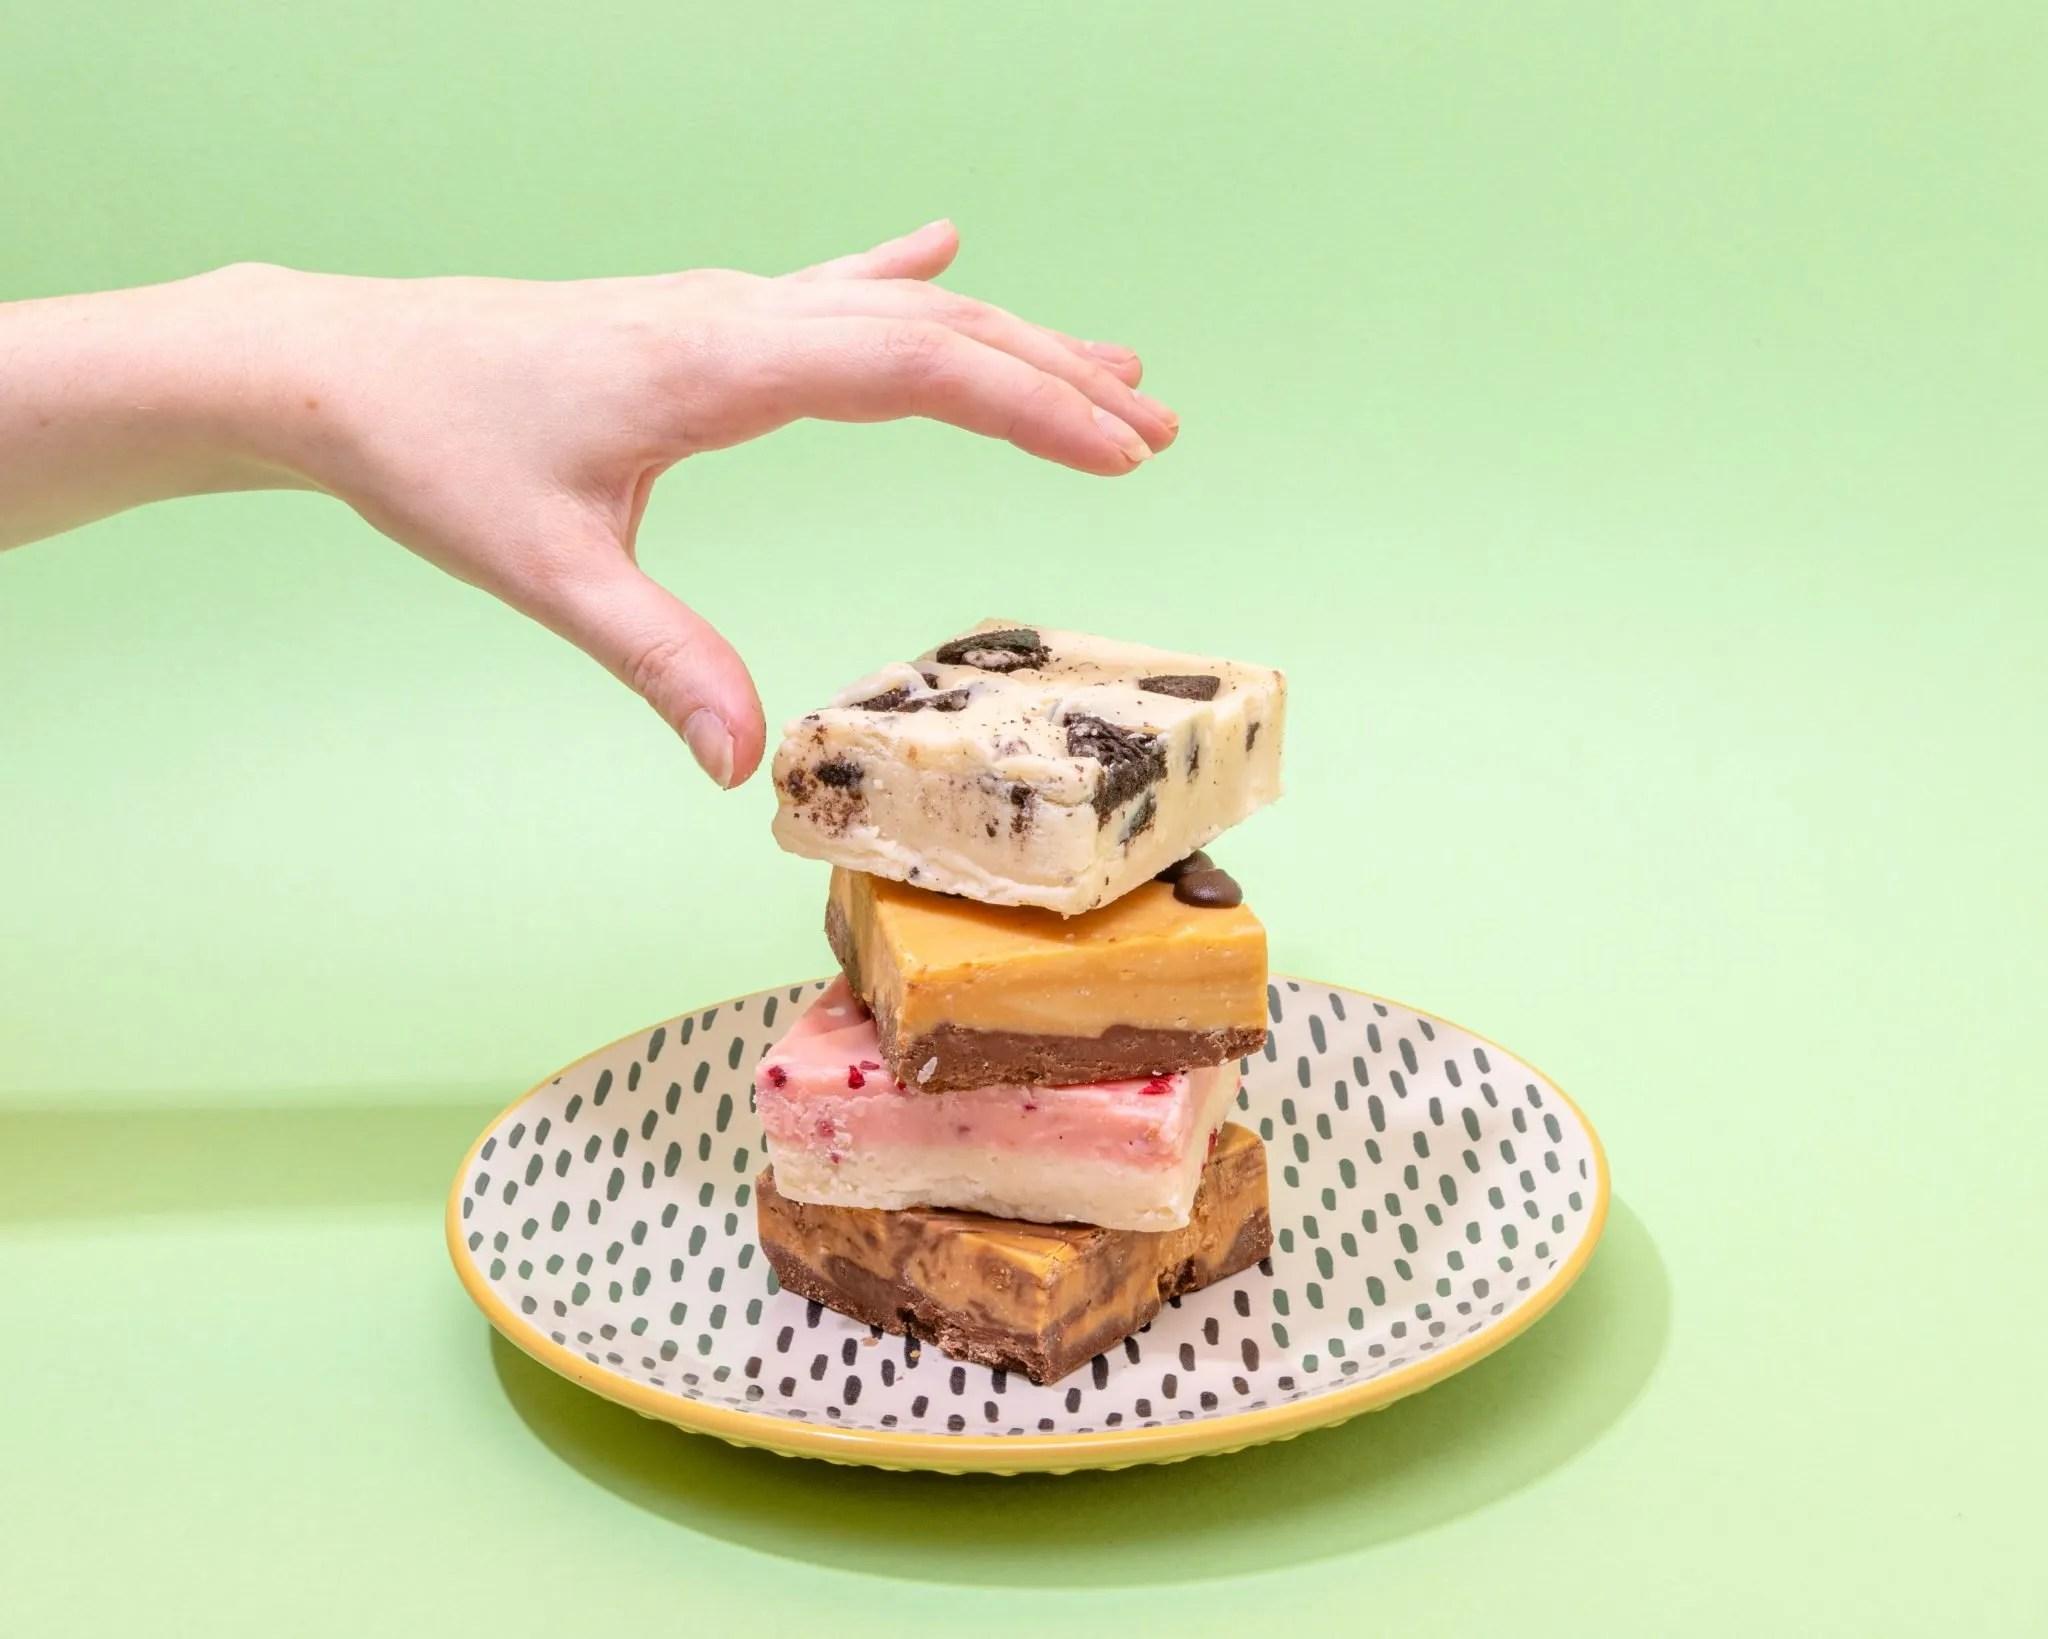 Slab Artisan Fudge - Grab A Slab!